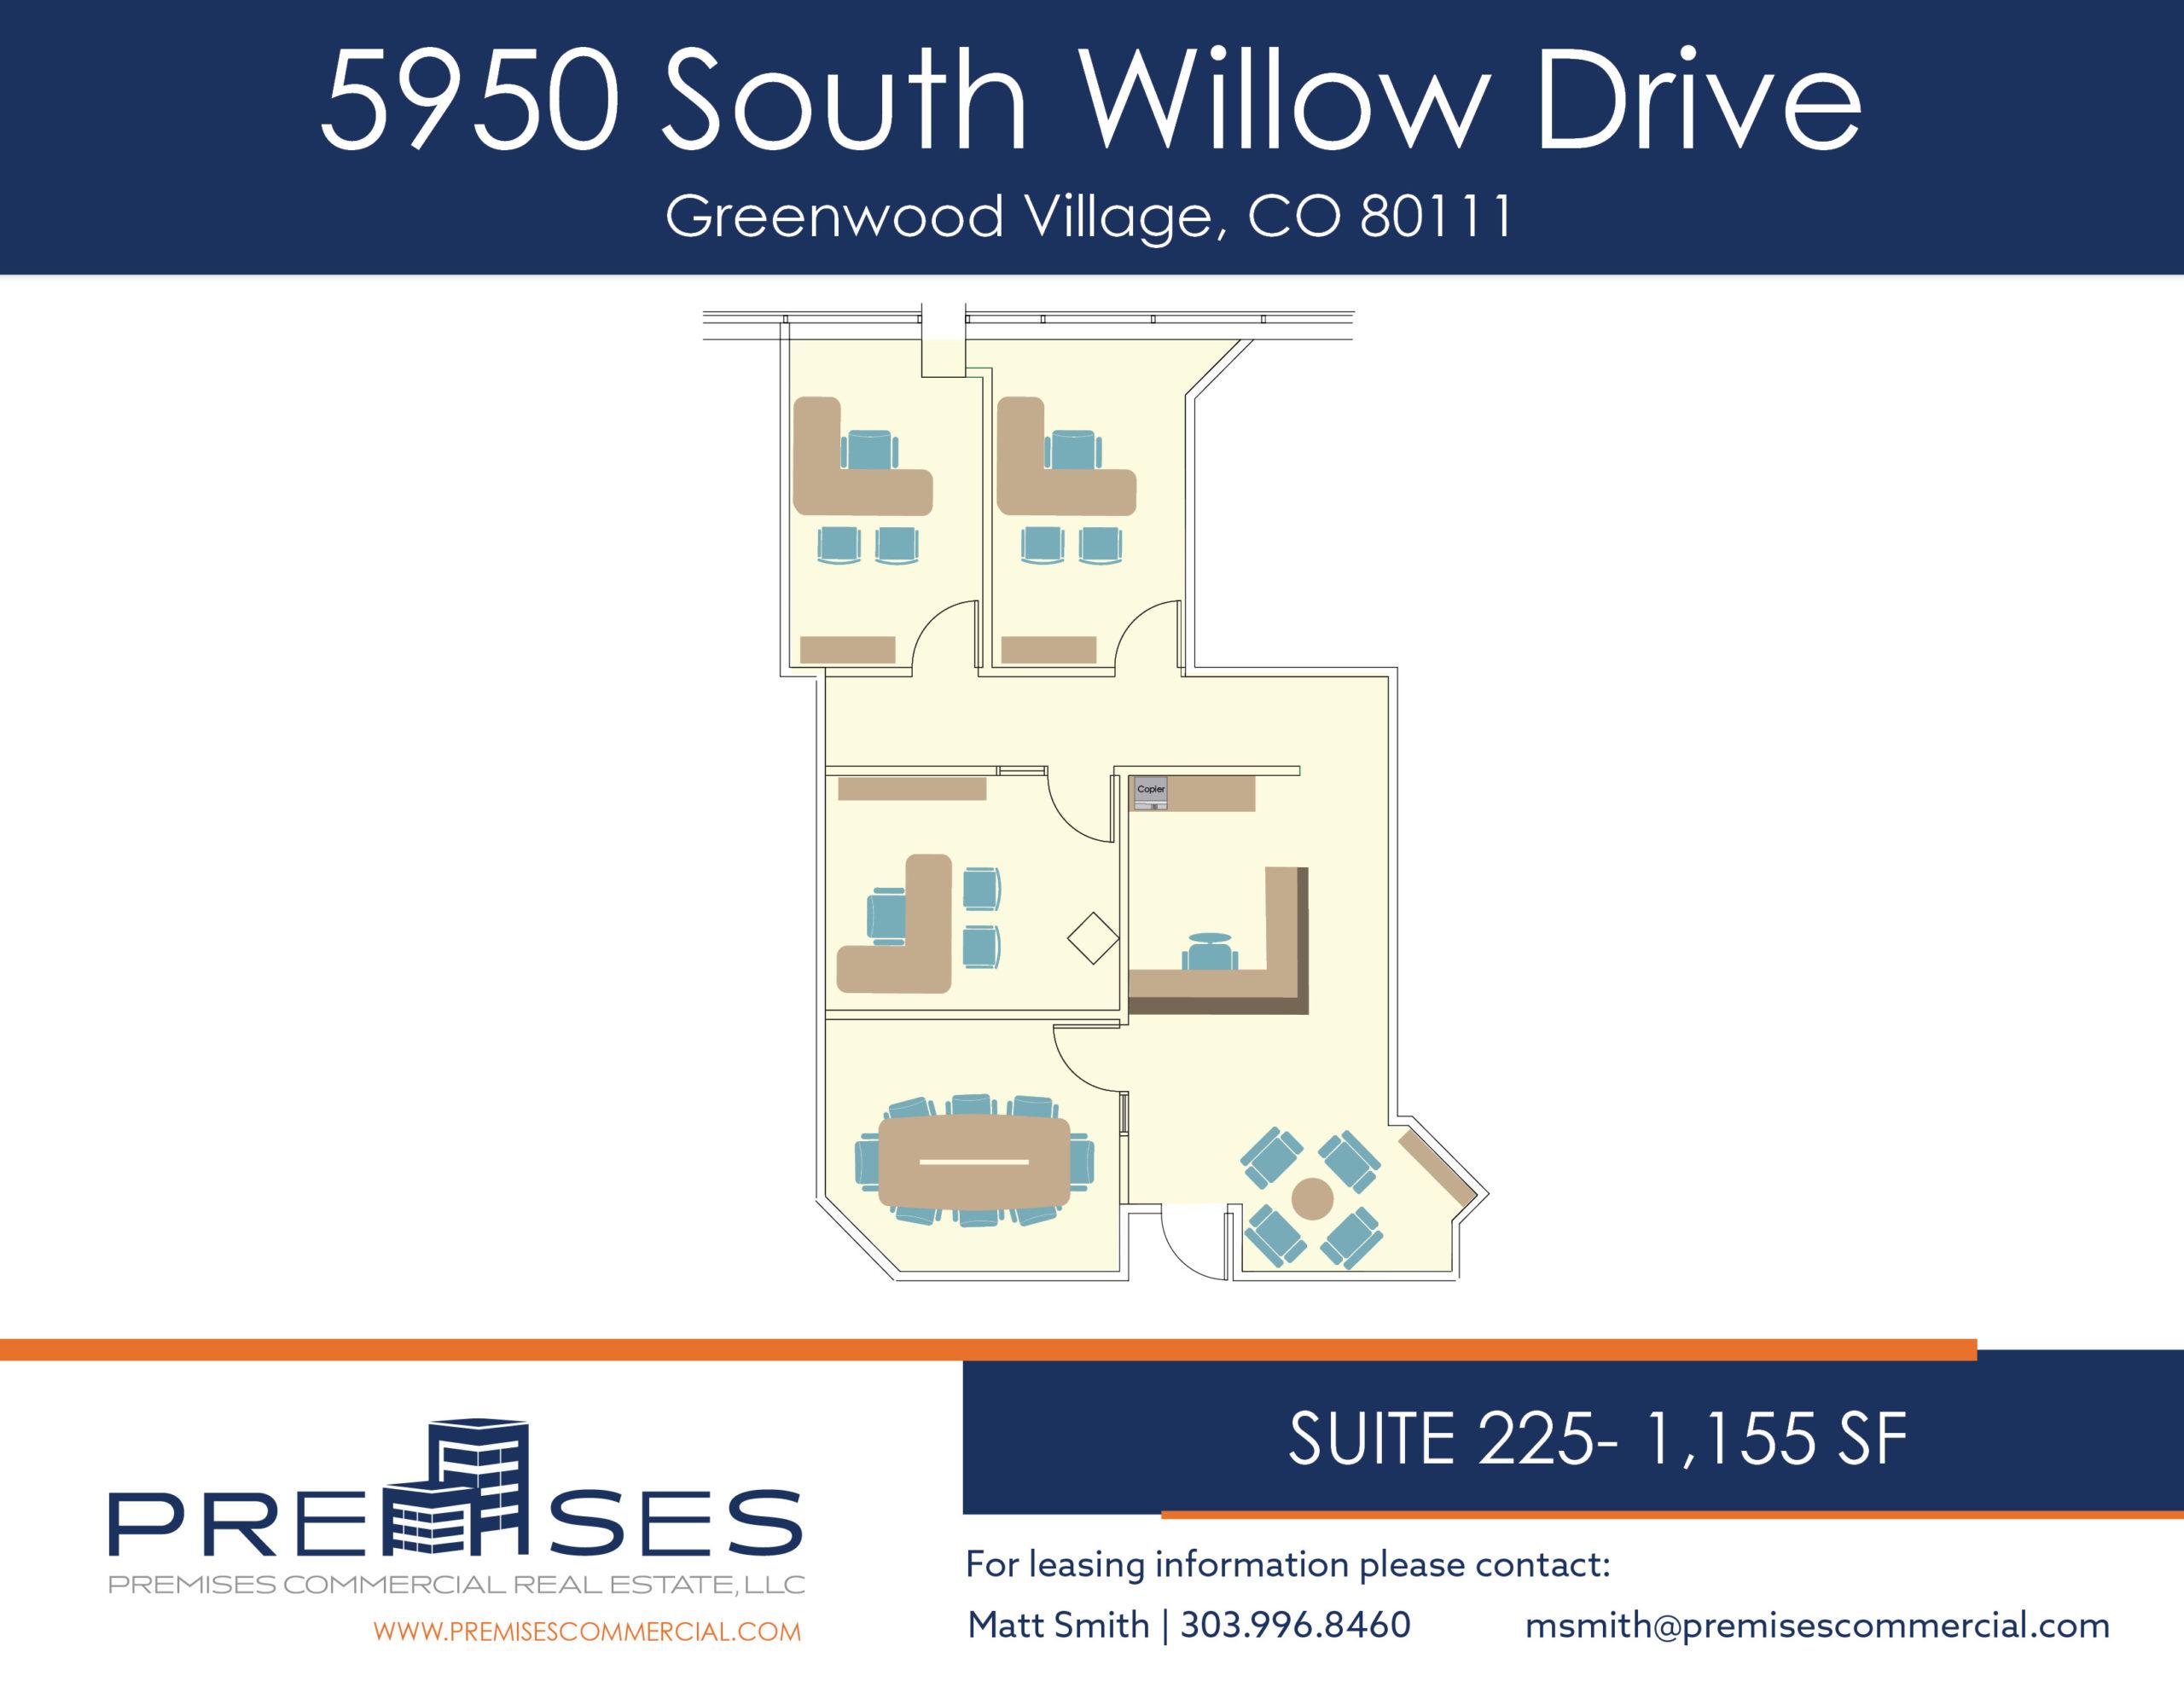 Suite 225 - 1,155 sf